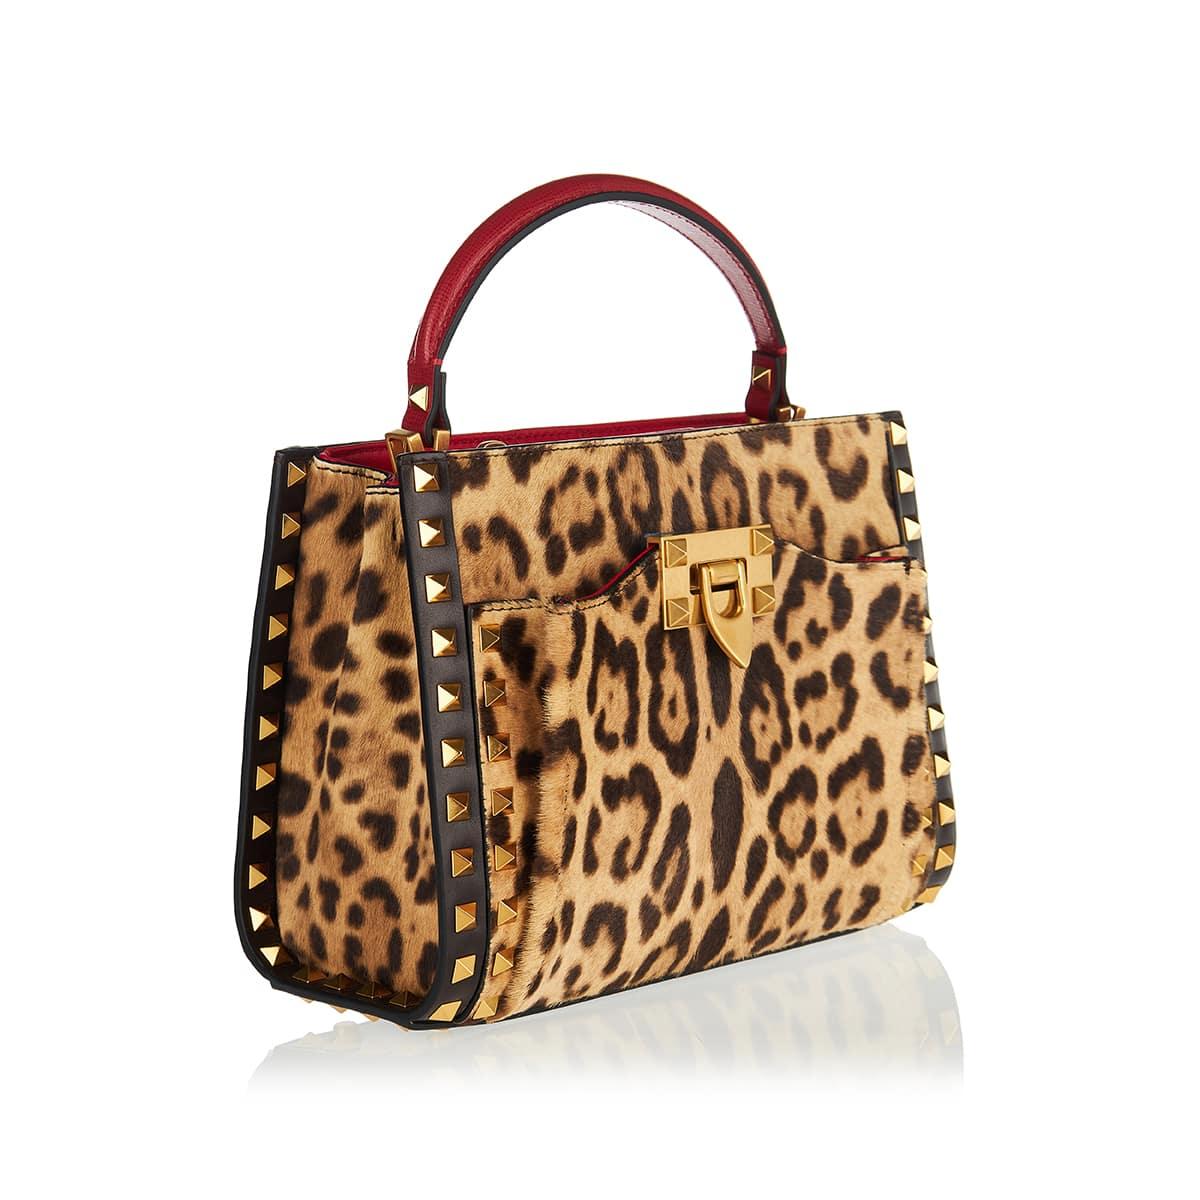 Rockstud Alcove small leopard calf-hair tote